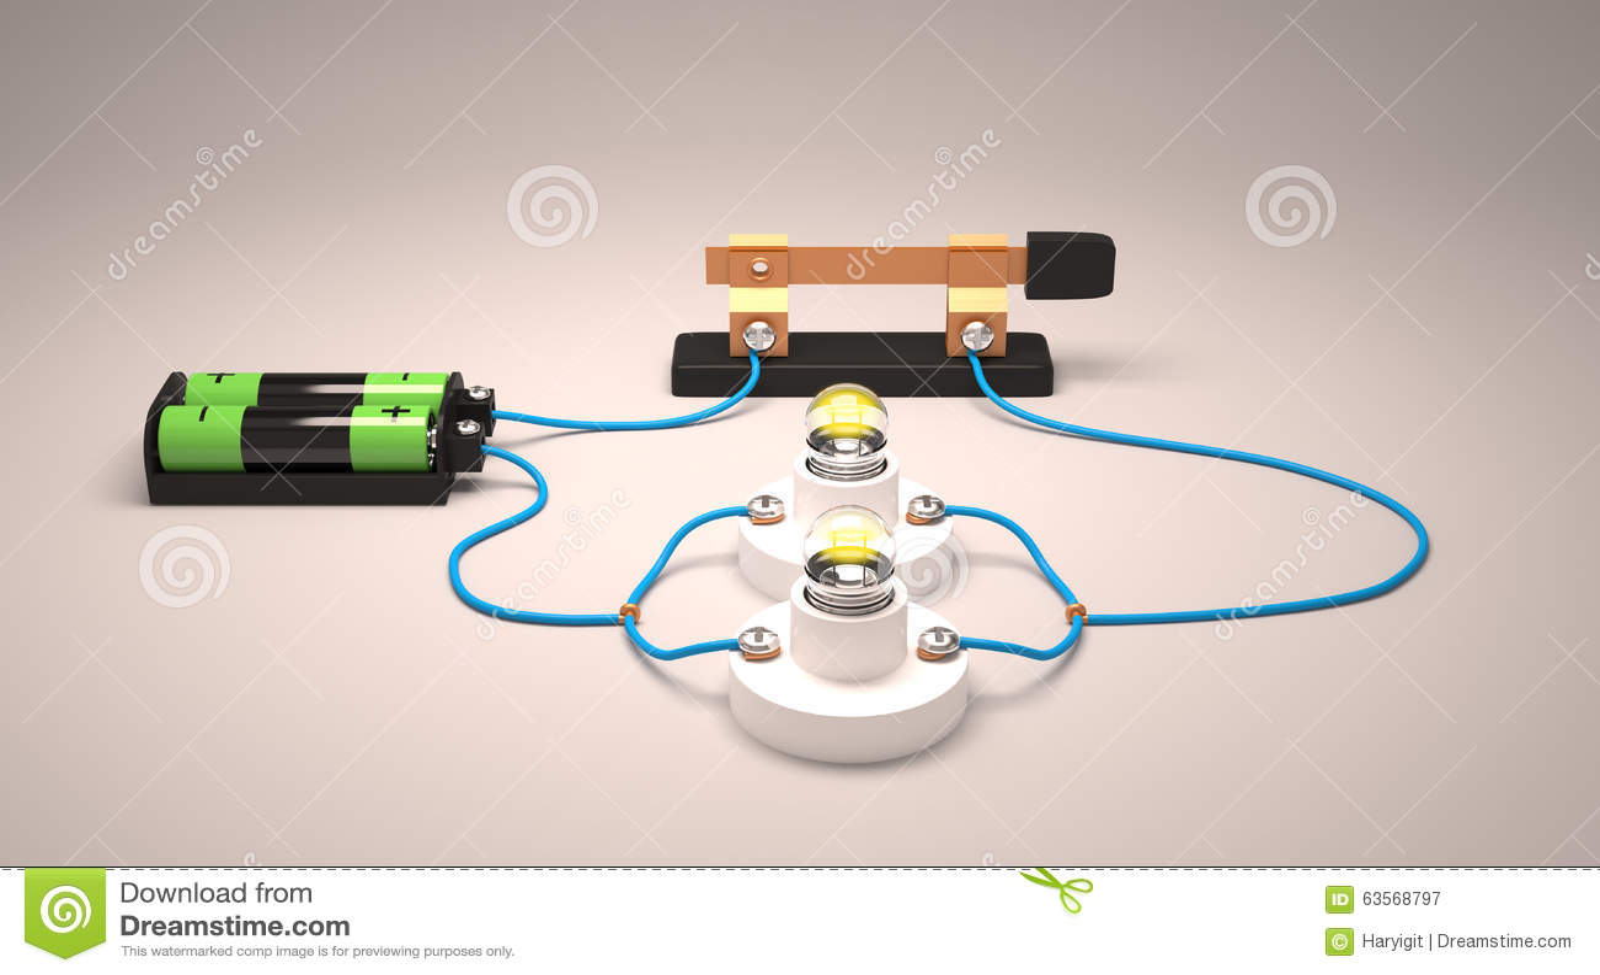 Circuito En Paralelo : Circuito eléctrico simple paralelo stock de ilustración